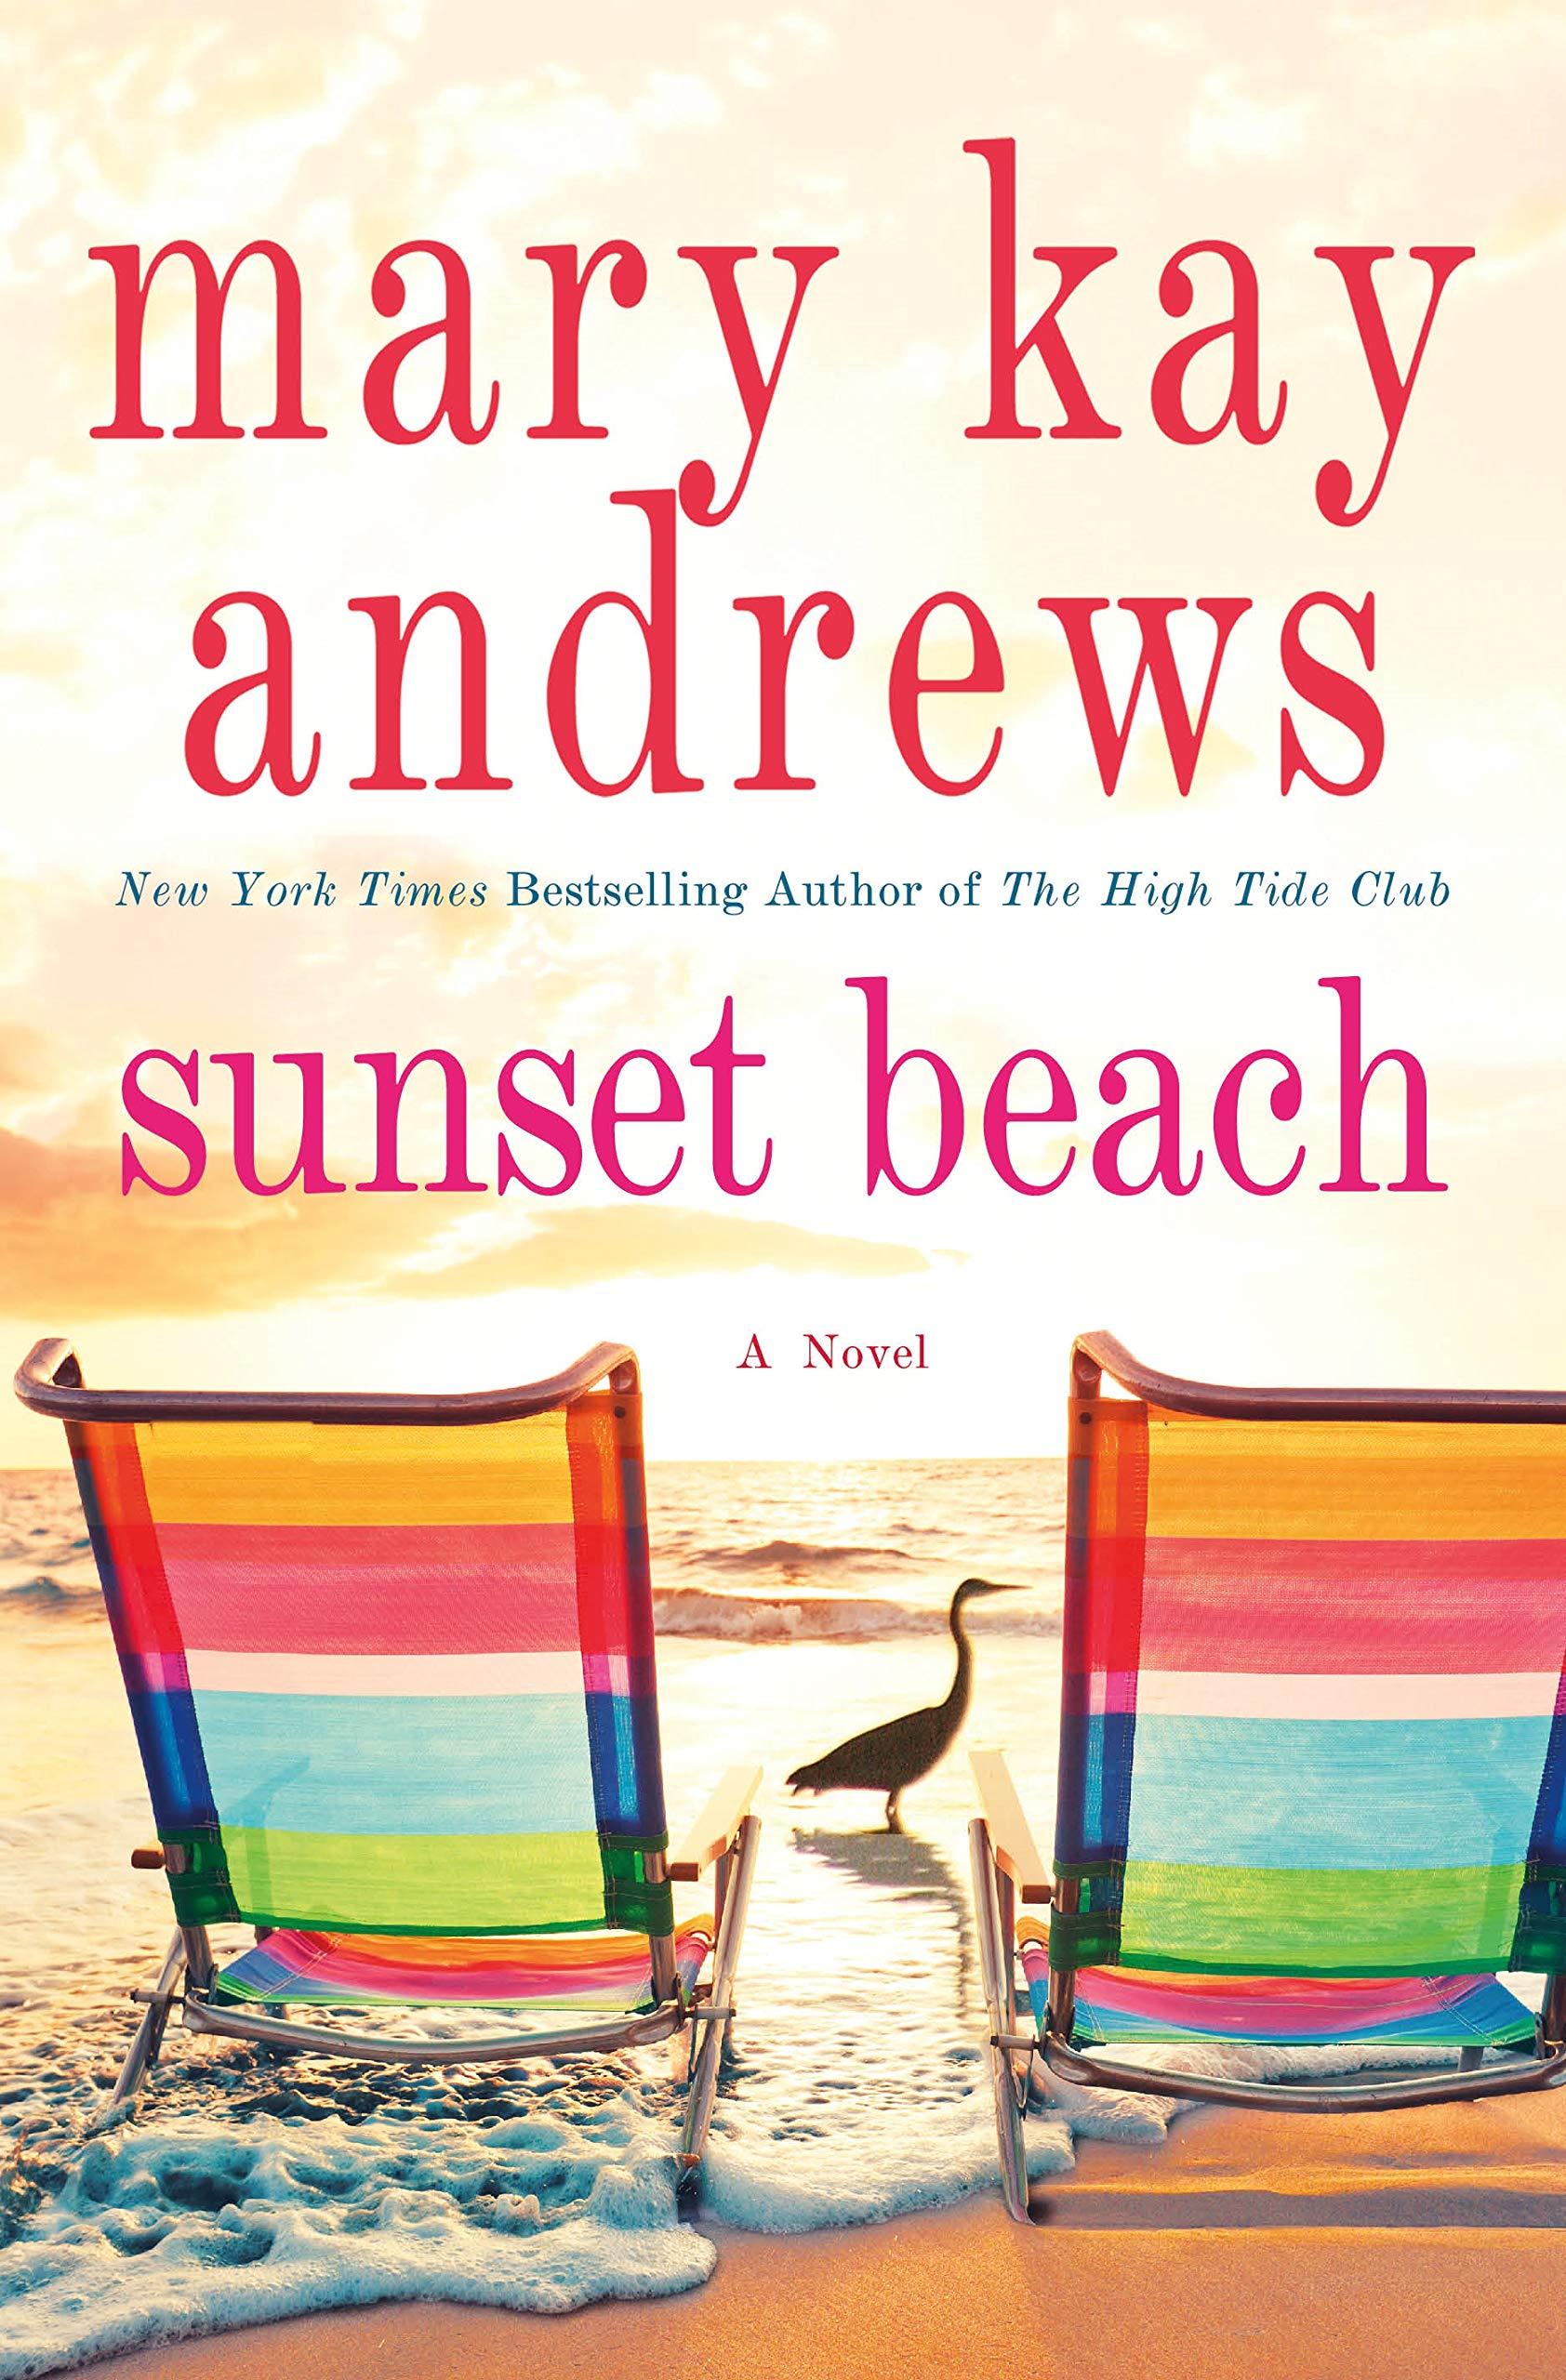 sunset beach by mary kay andrews.jpg